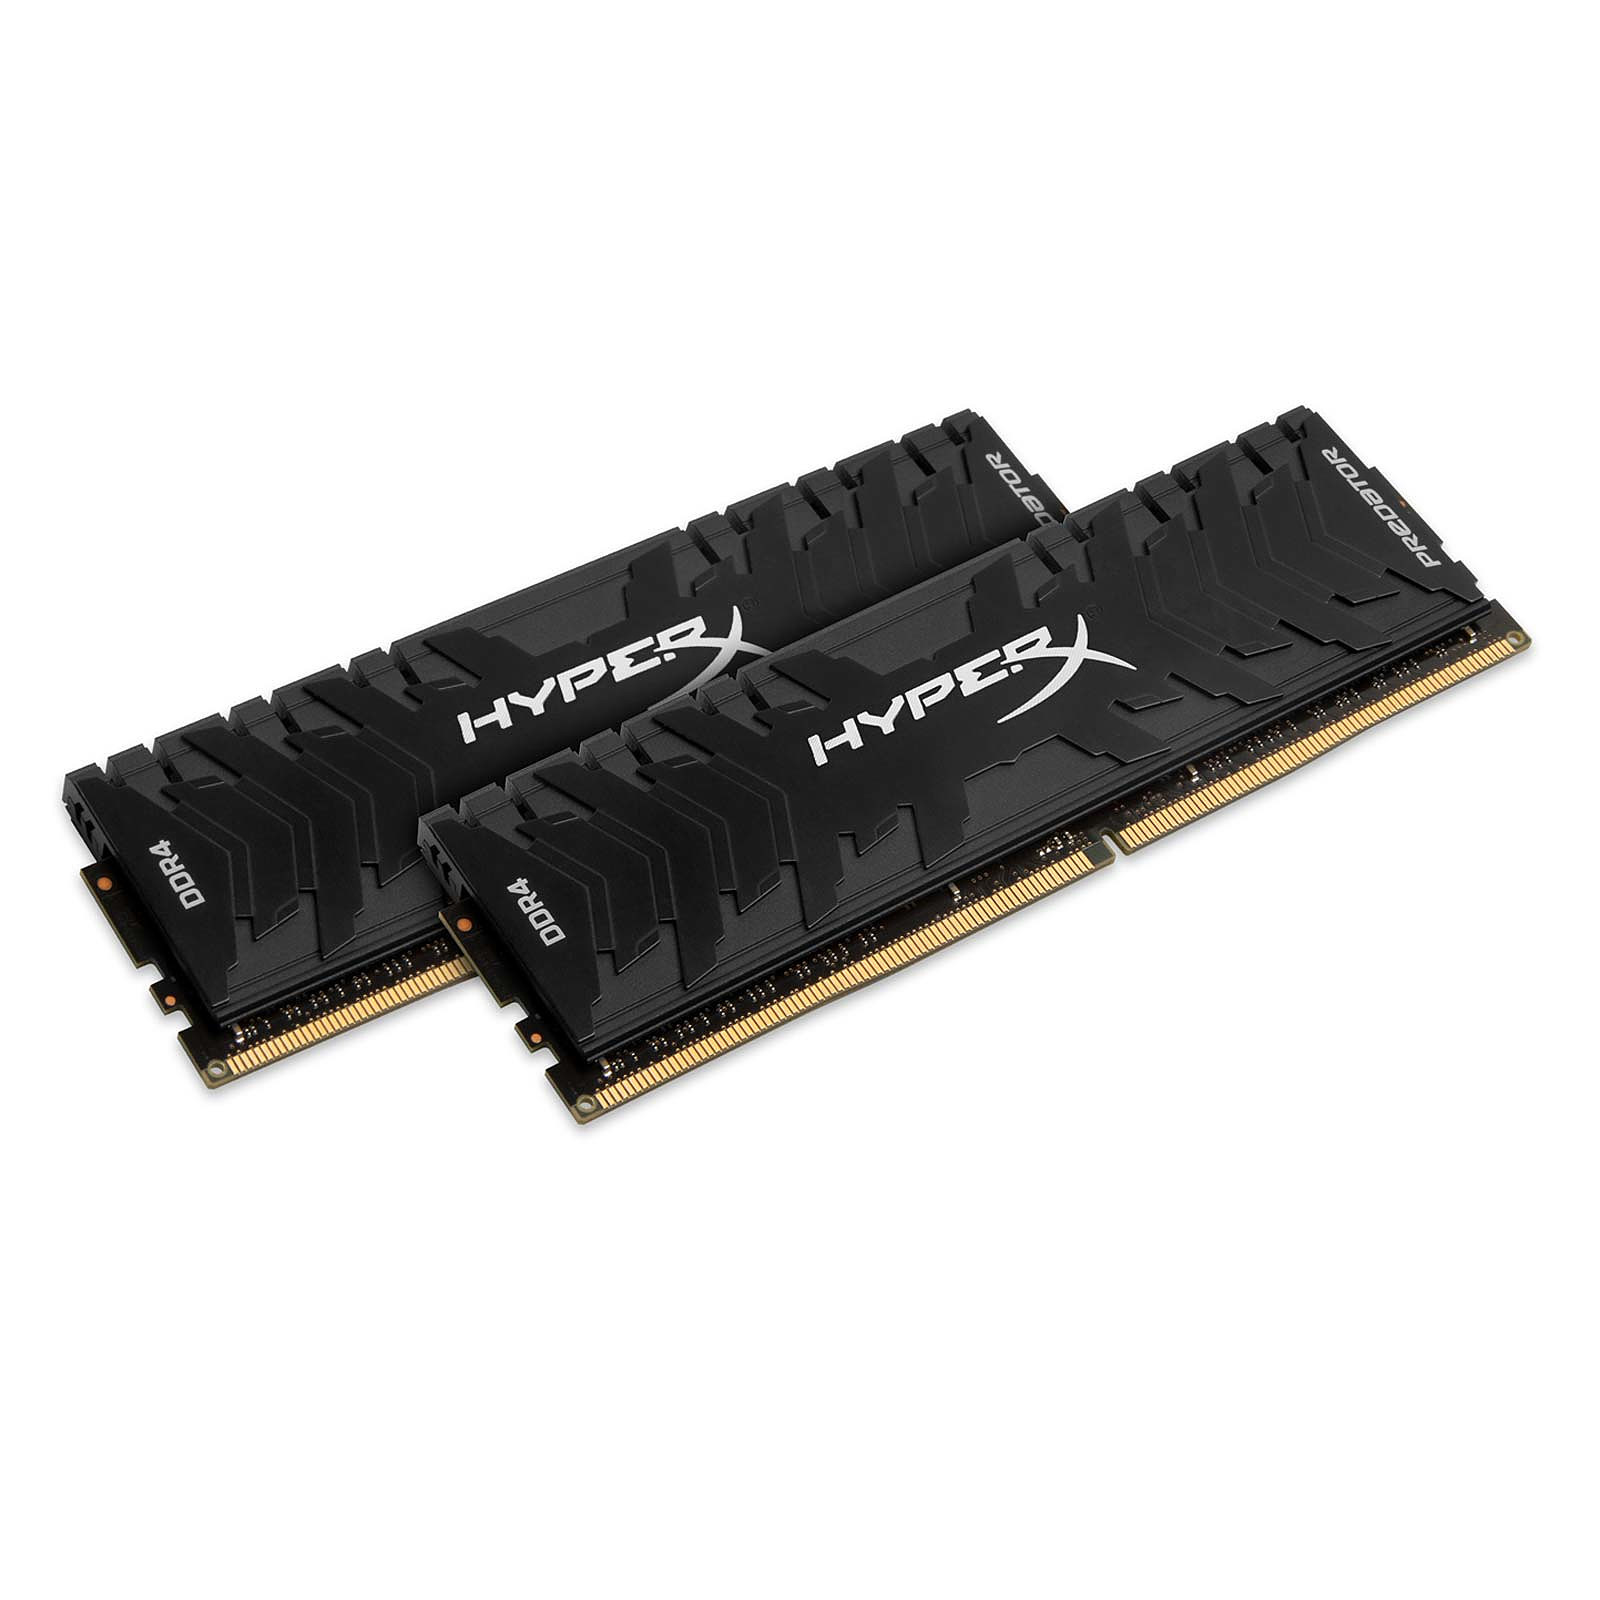 HyperX Predator Noir 16 Go (2 x 8 Go) DDR4 2666 MHz CL13